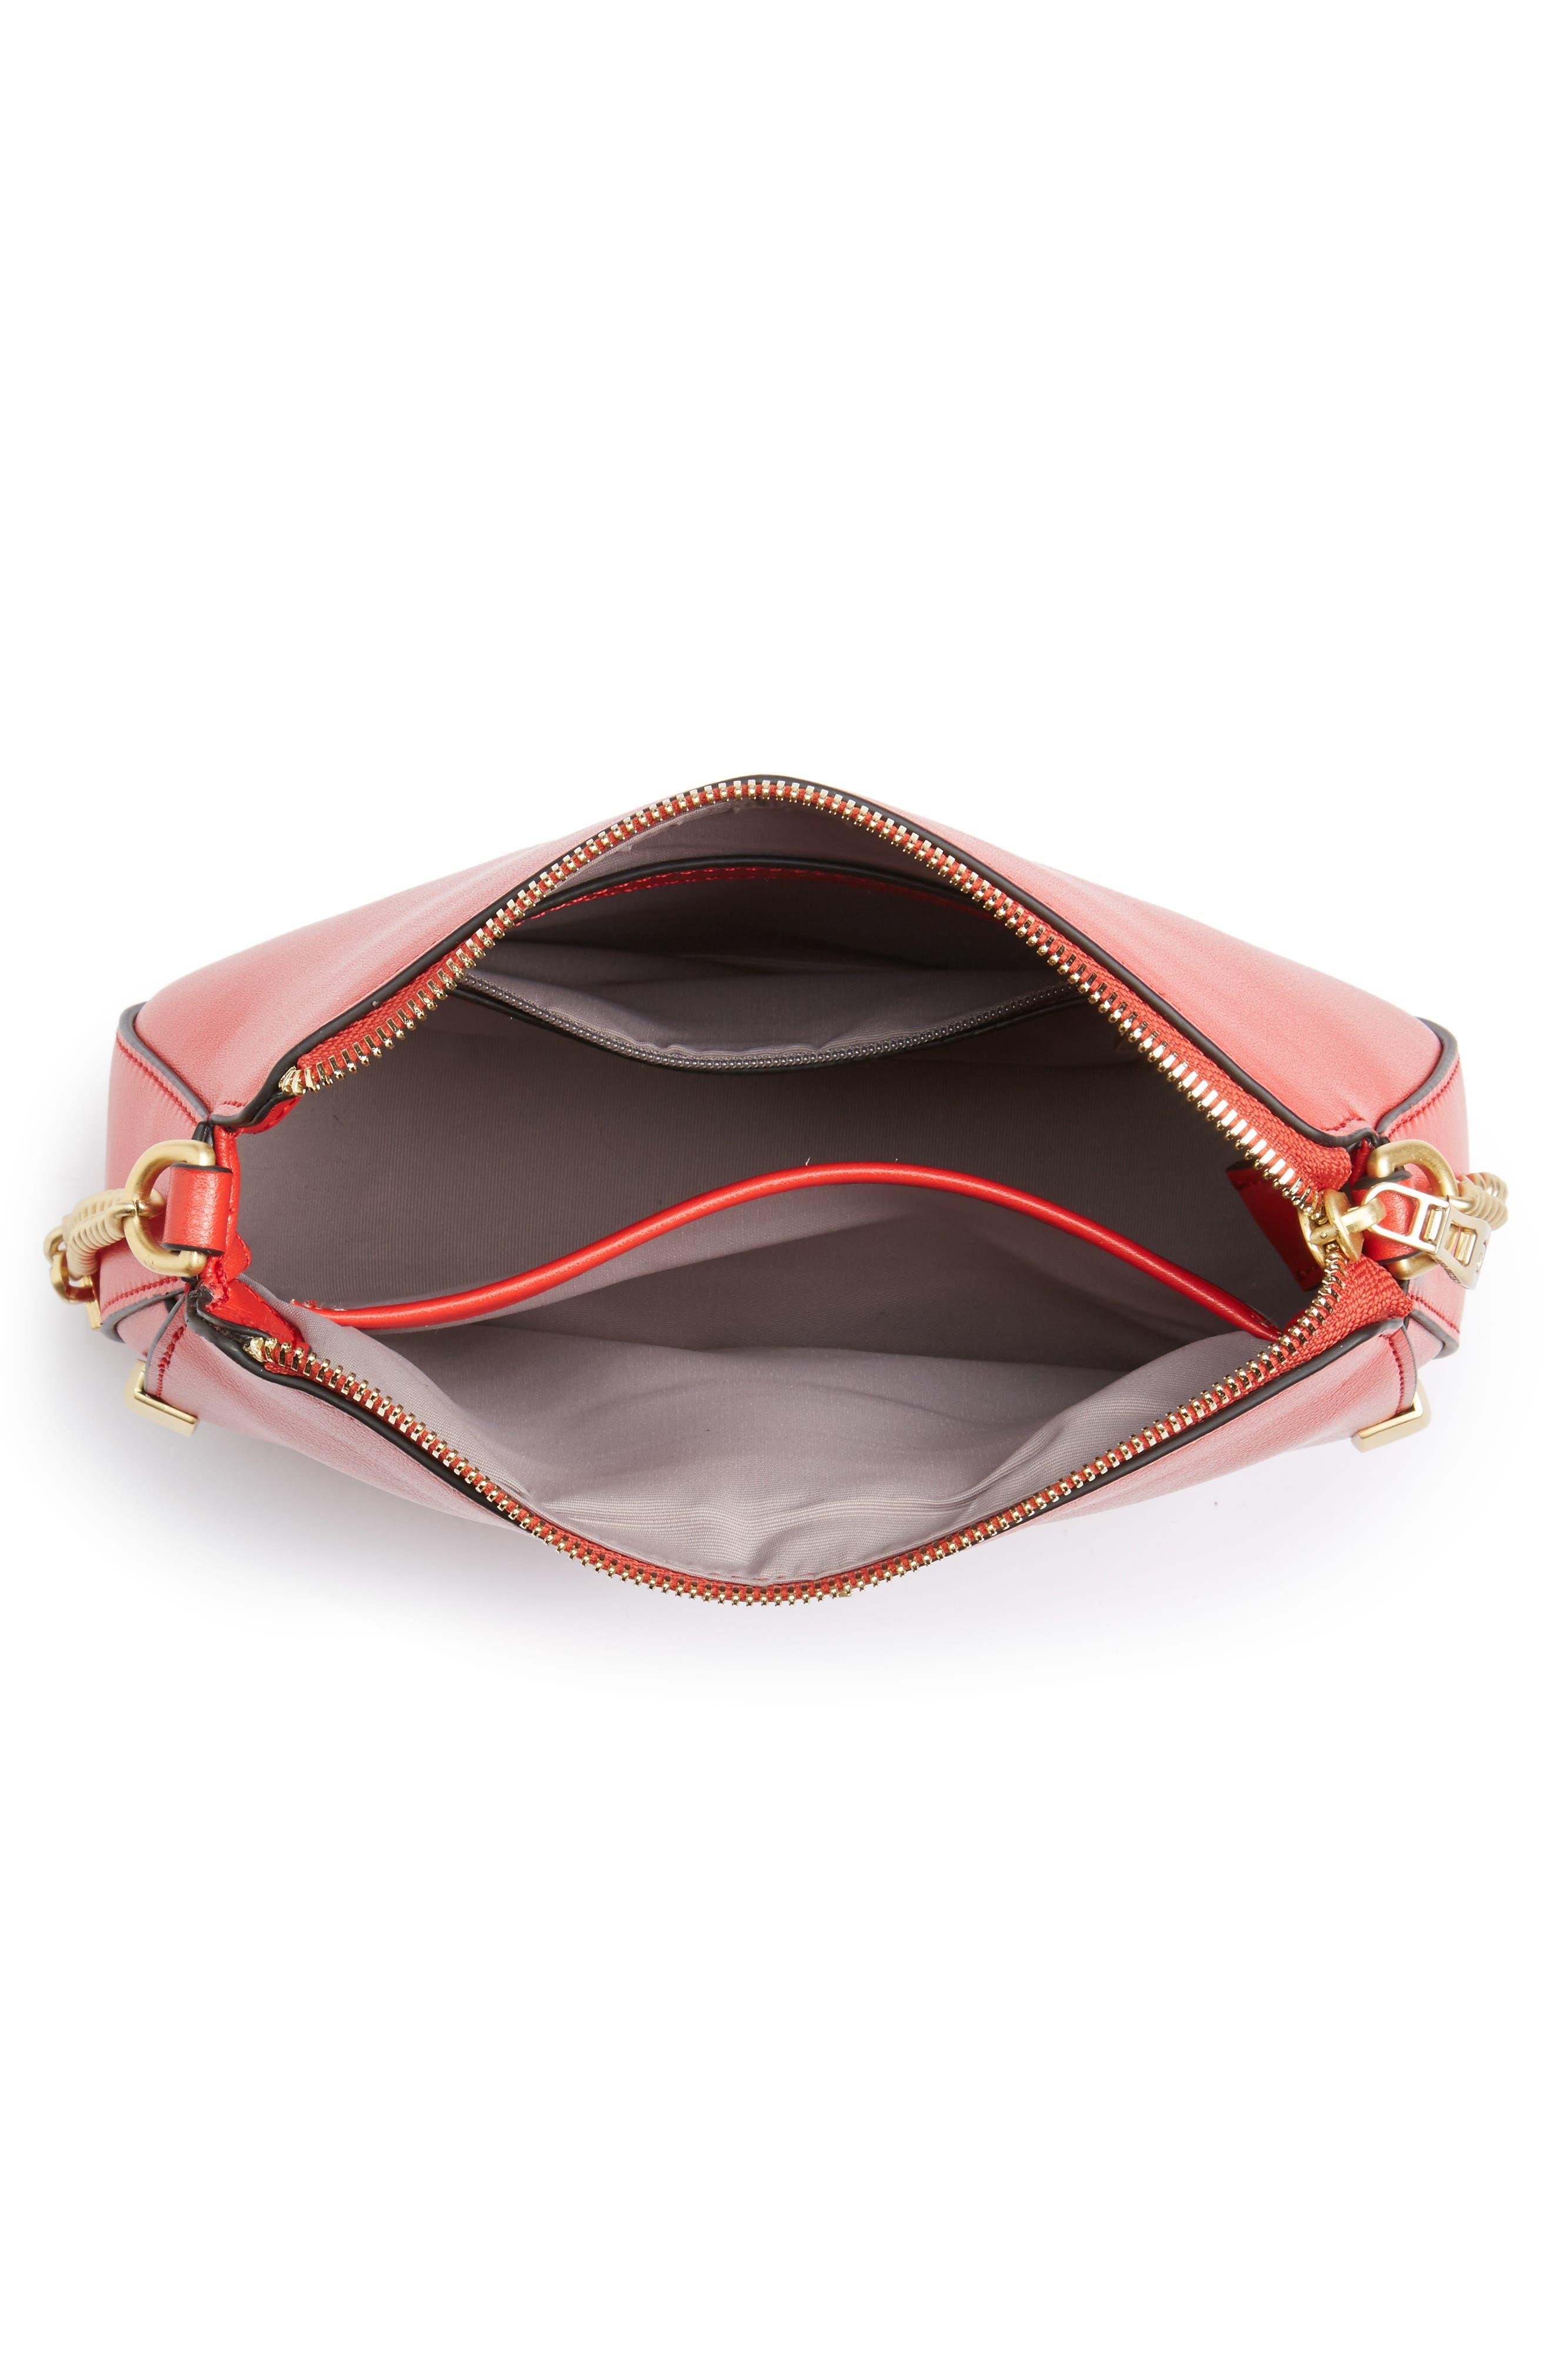 Céline Dion Octave Leather Crossbody Bag,                             Alternate thumbnail 4, color,                             Red